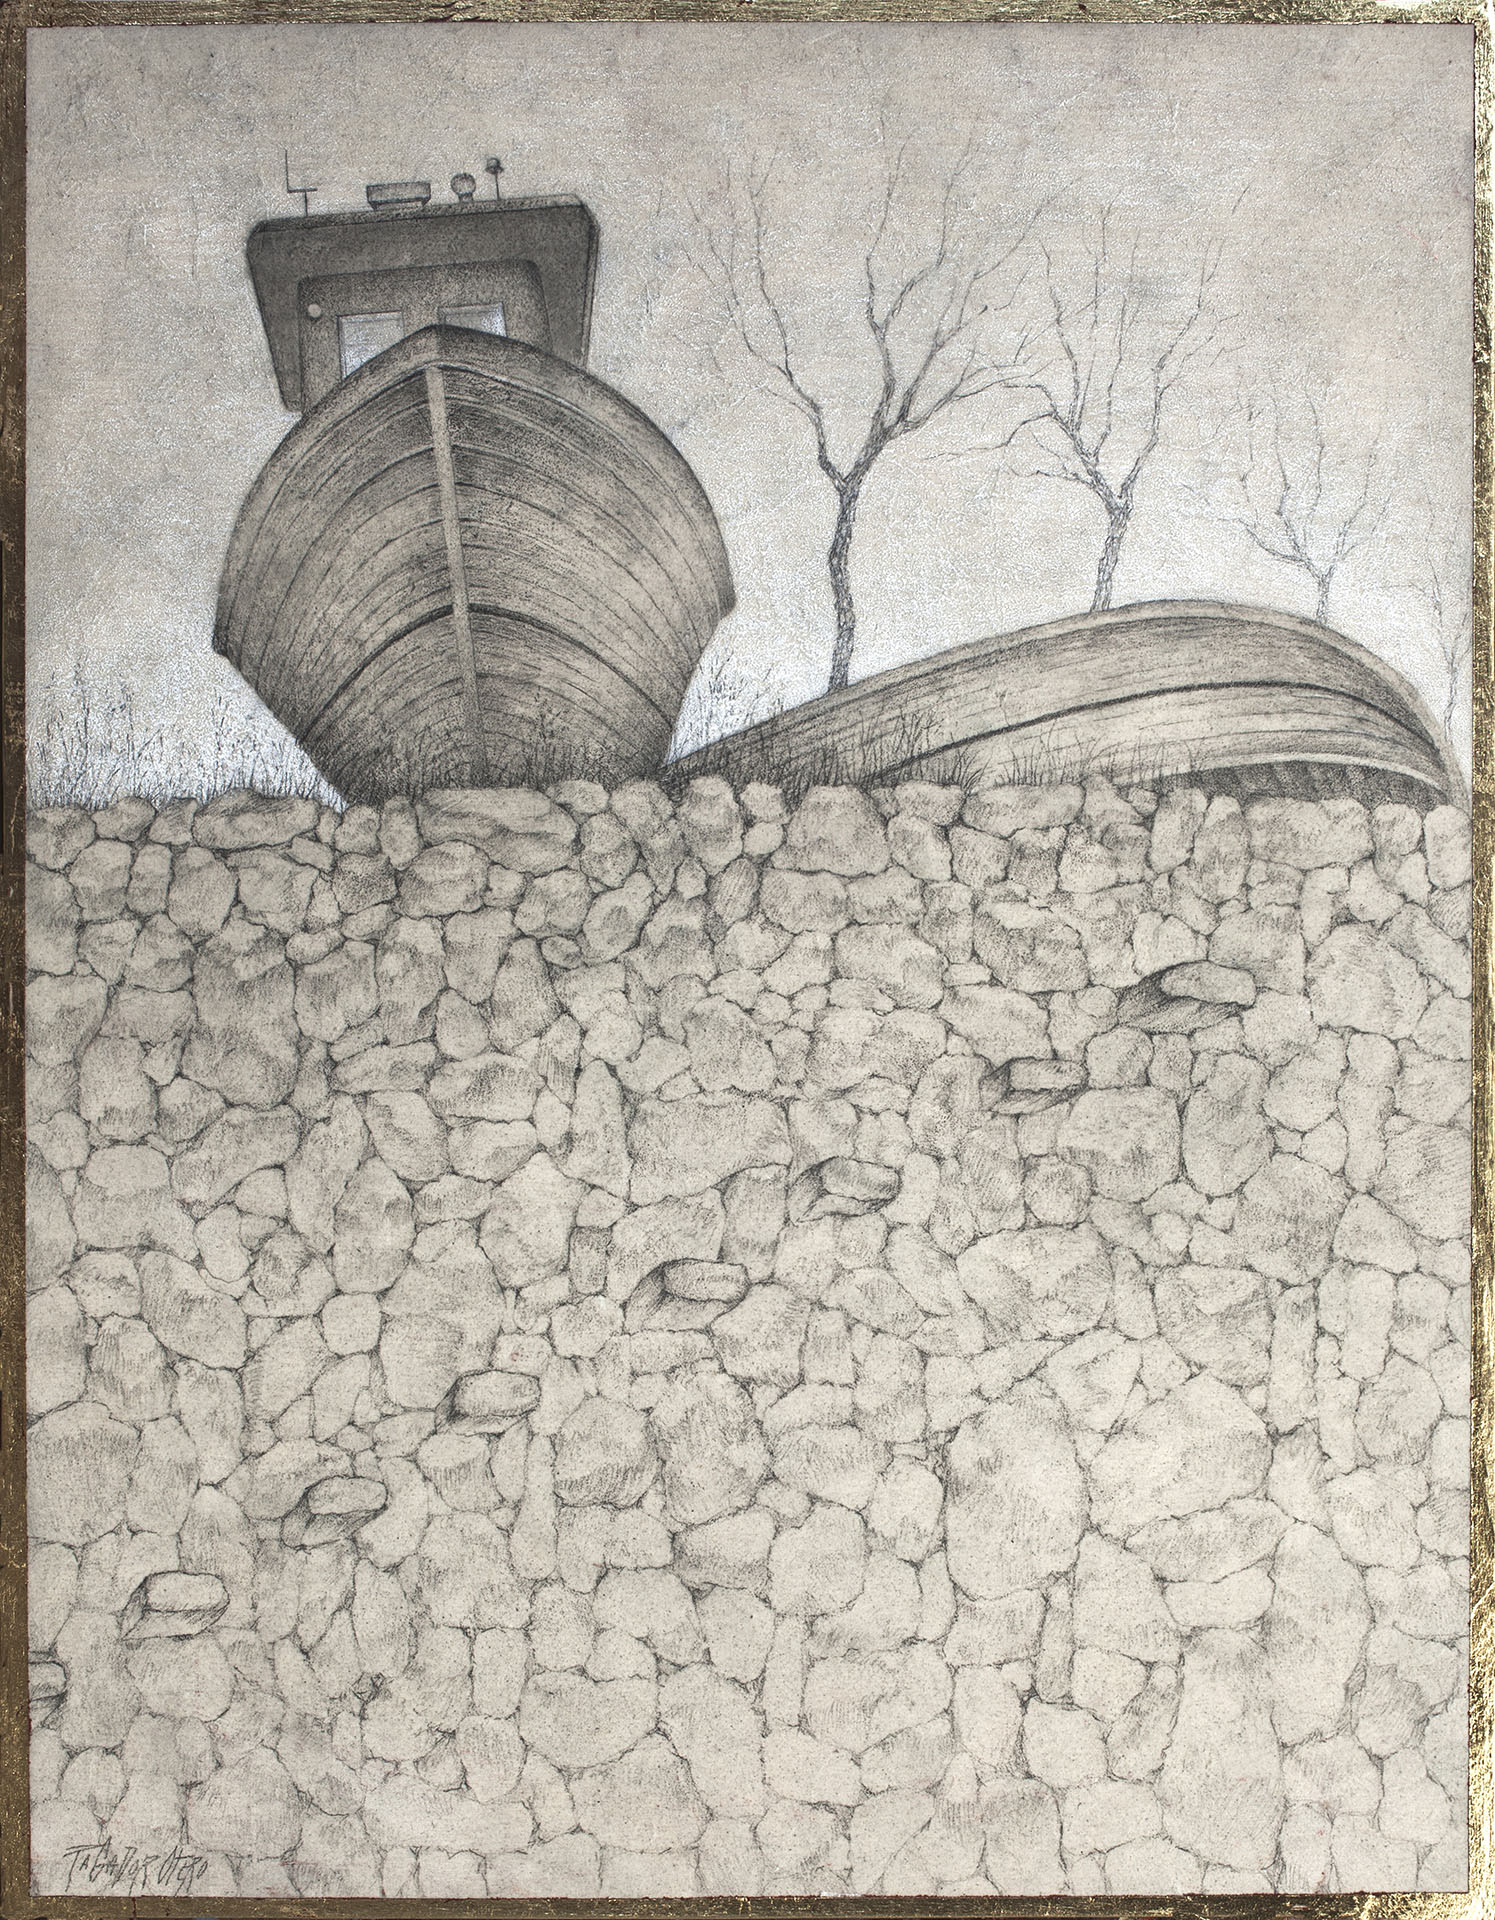 """INSOLITO""  Grafito y Tiza S/Tabla  50x38 cm. 2020 Gata de Gorgos"